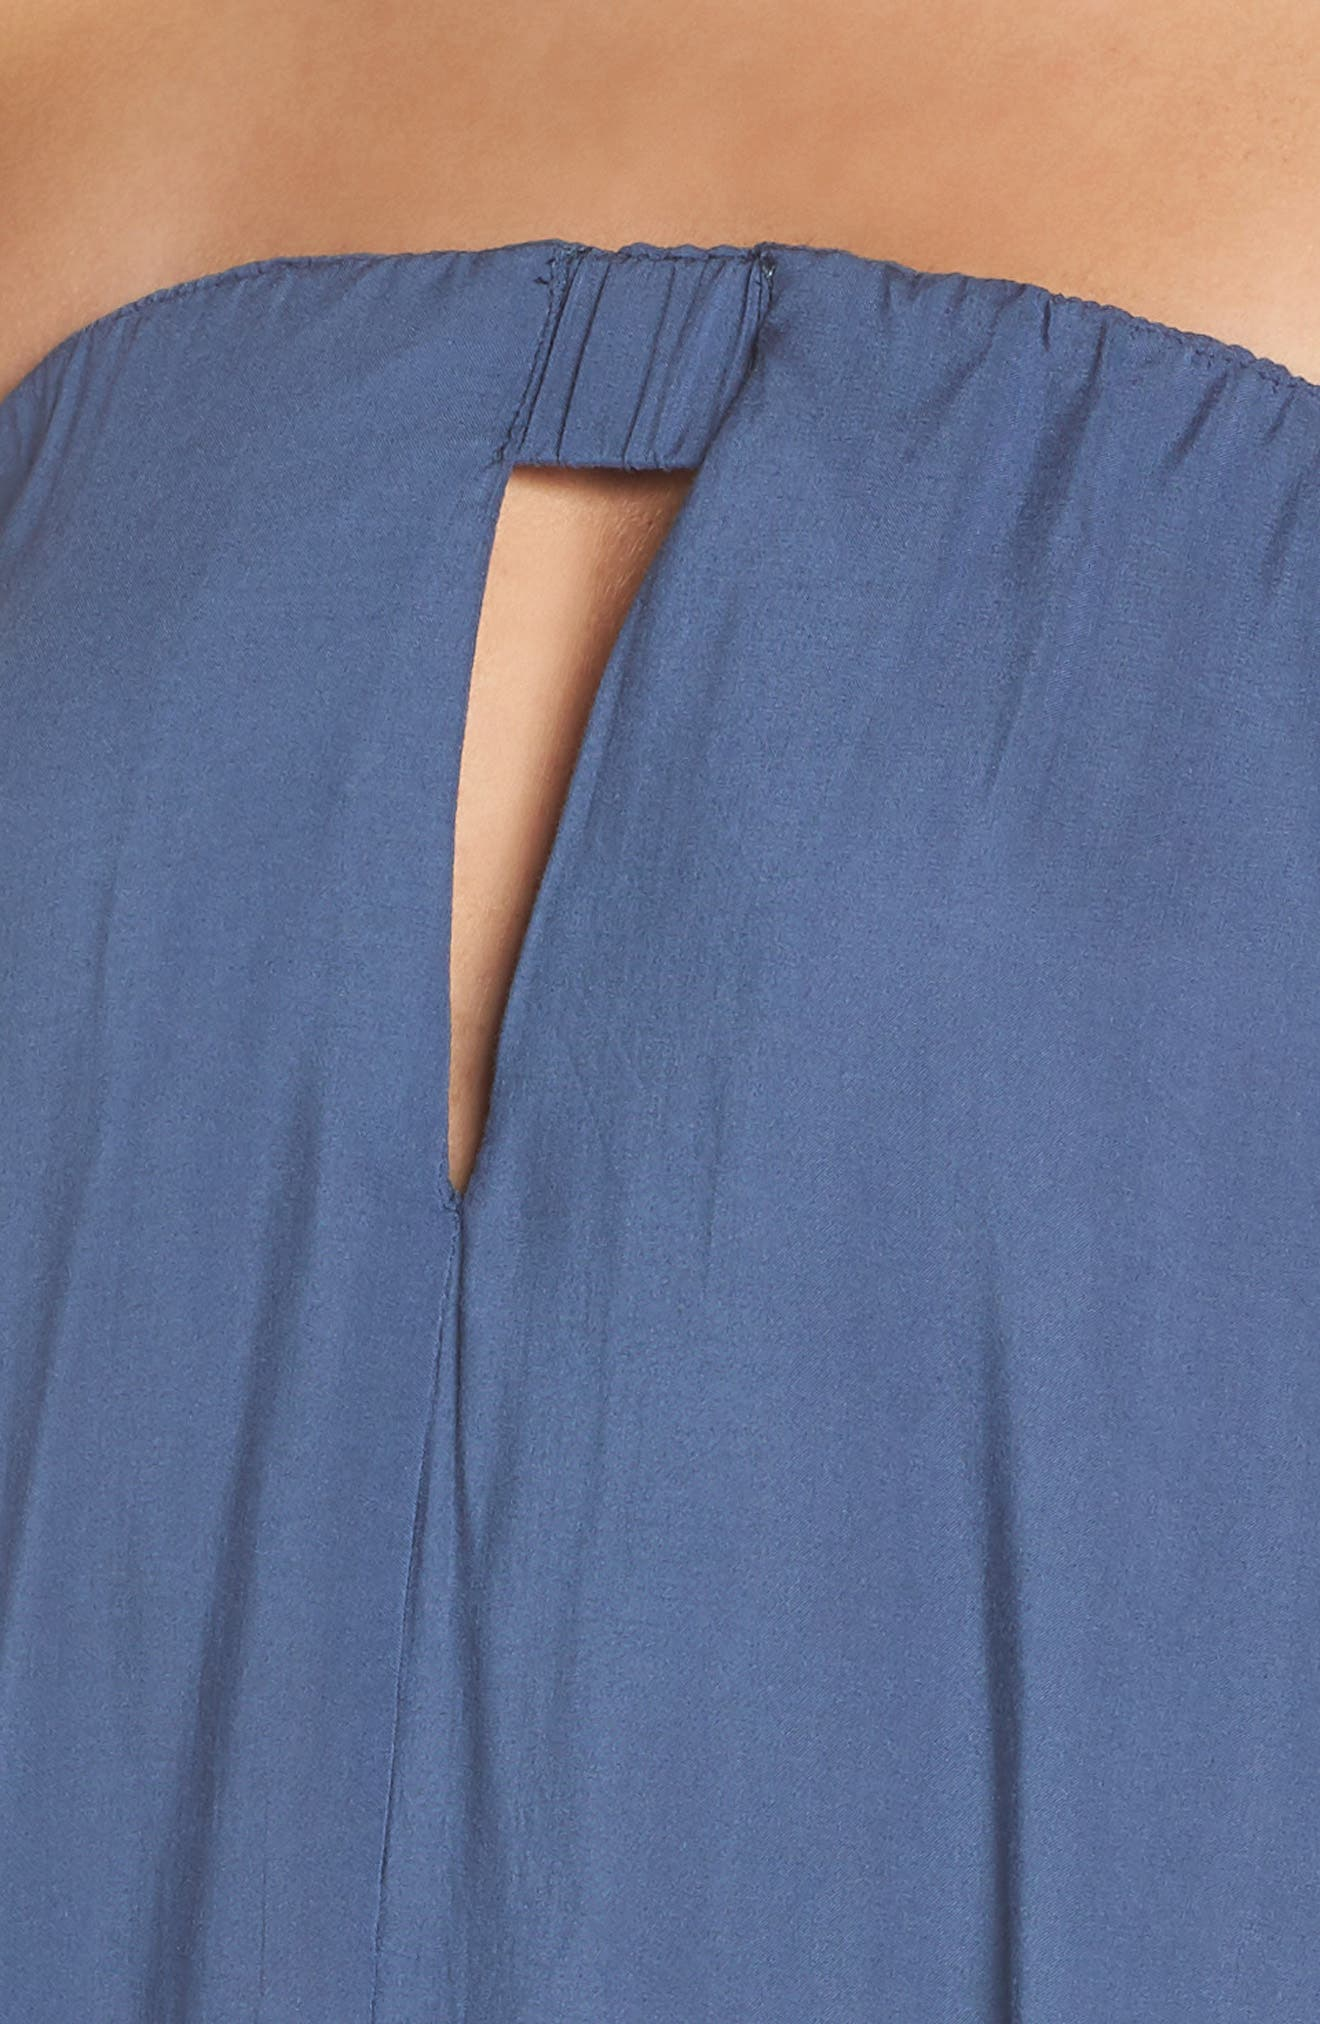 Strapless Keyhole Cover-Up Maxi Dress,                             Alternate thumbnail 4, color,                             Indigo